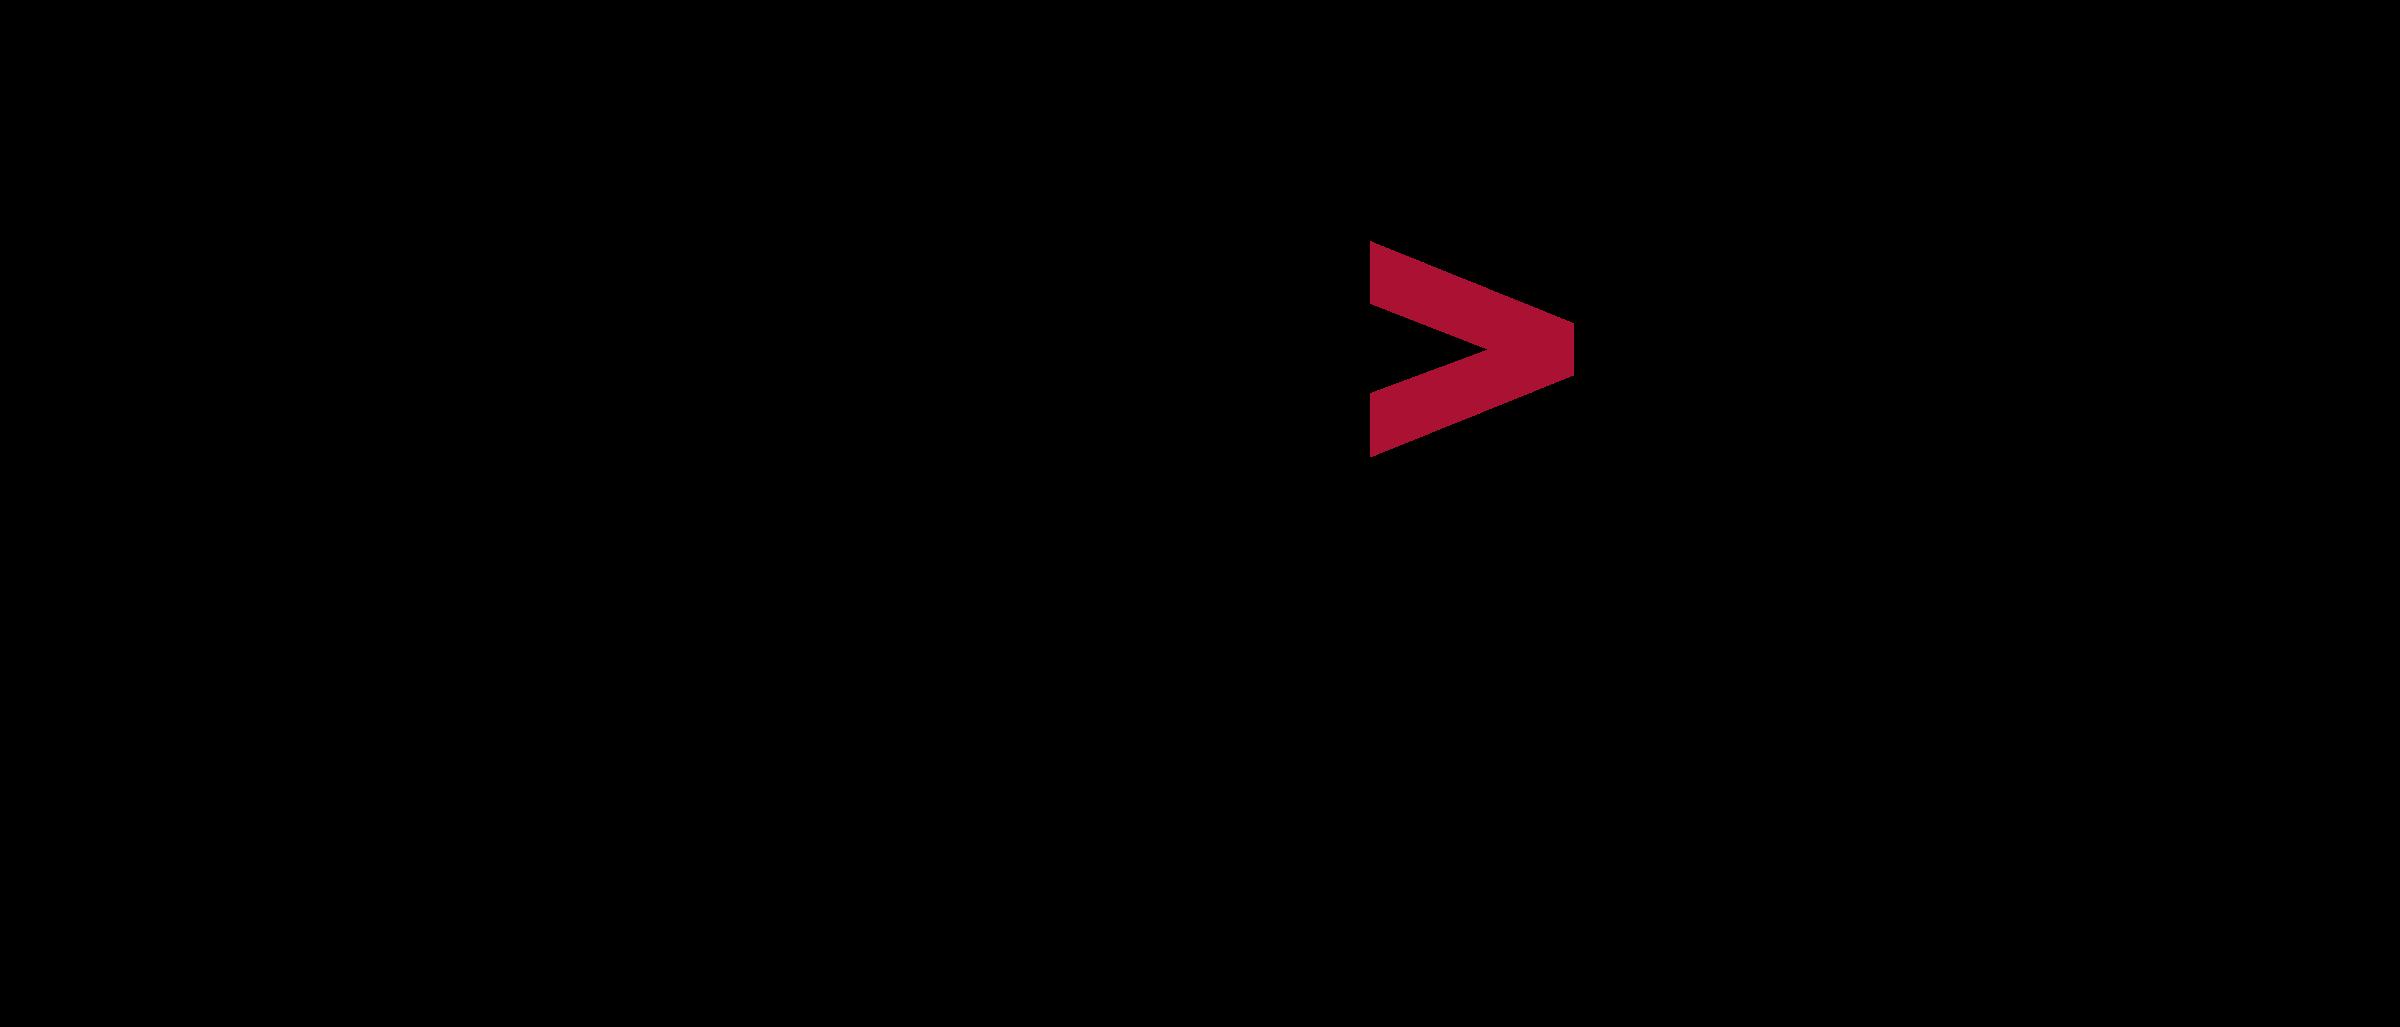 accenture-logo-png-transparent-1.png